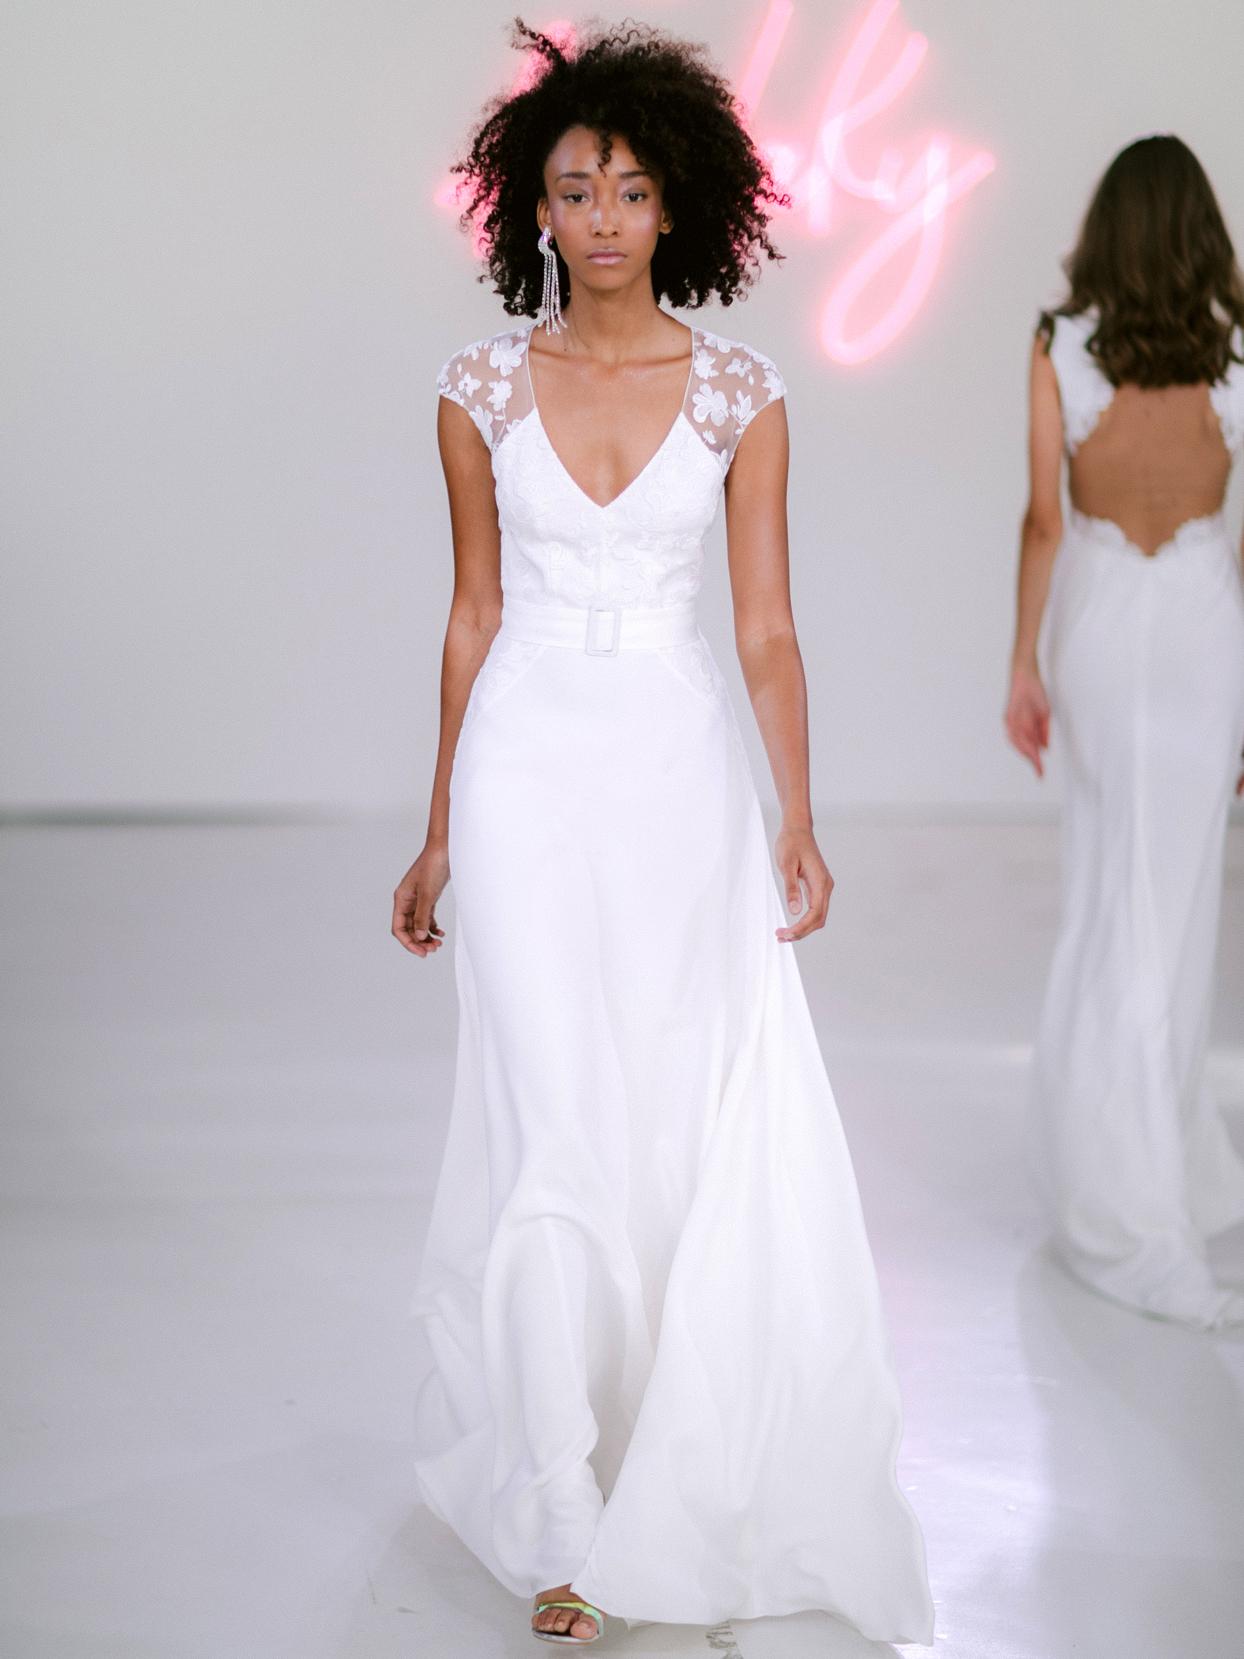 Rime Arodaky X The Mews Bridal lace cap sleeve v-neck belted wedding dress fall 2020